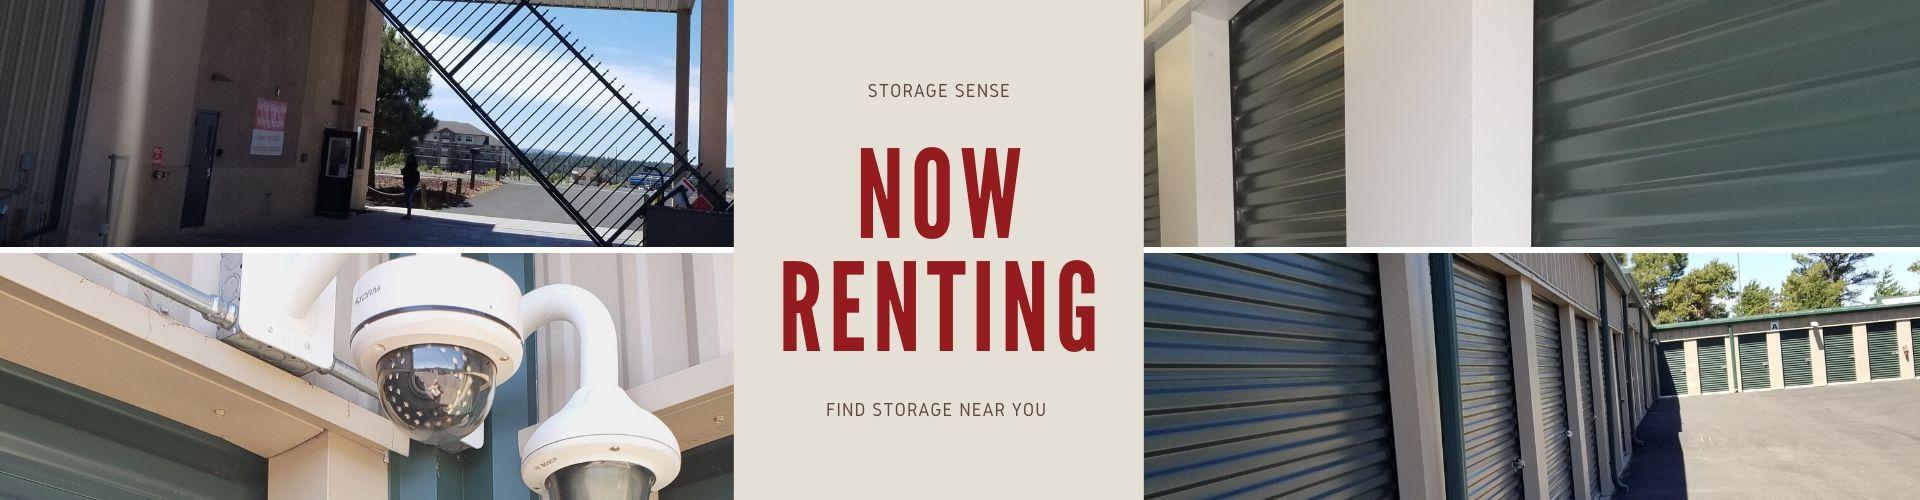 Renting Self Storage in Flagstaff AZ